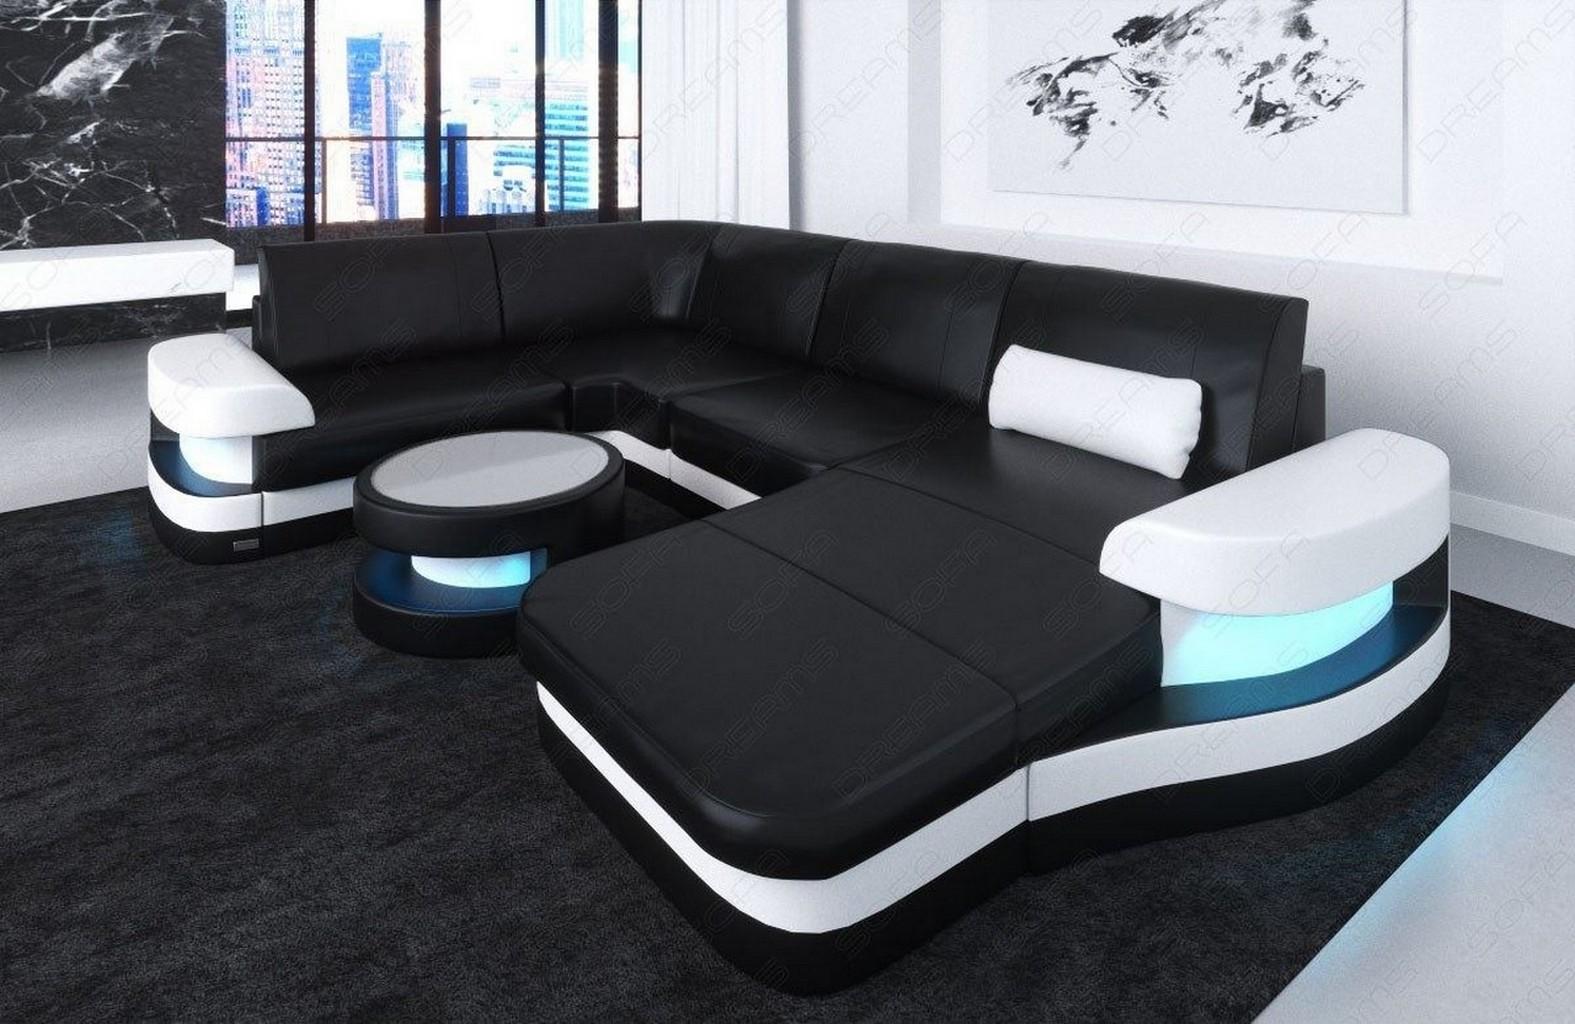 leder ecksofa ledersofa eckcouch sofa modena u form design couch led beleuchtung ebay